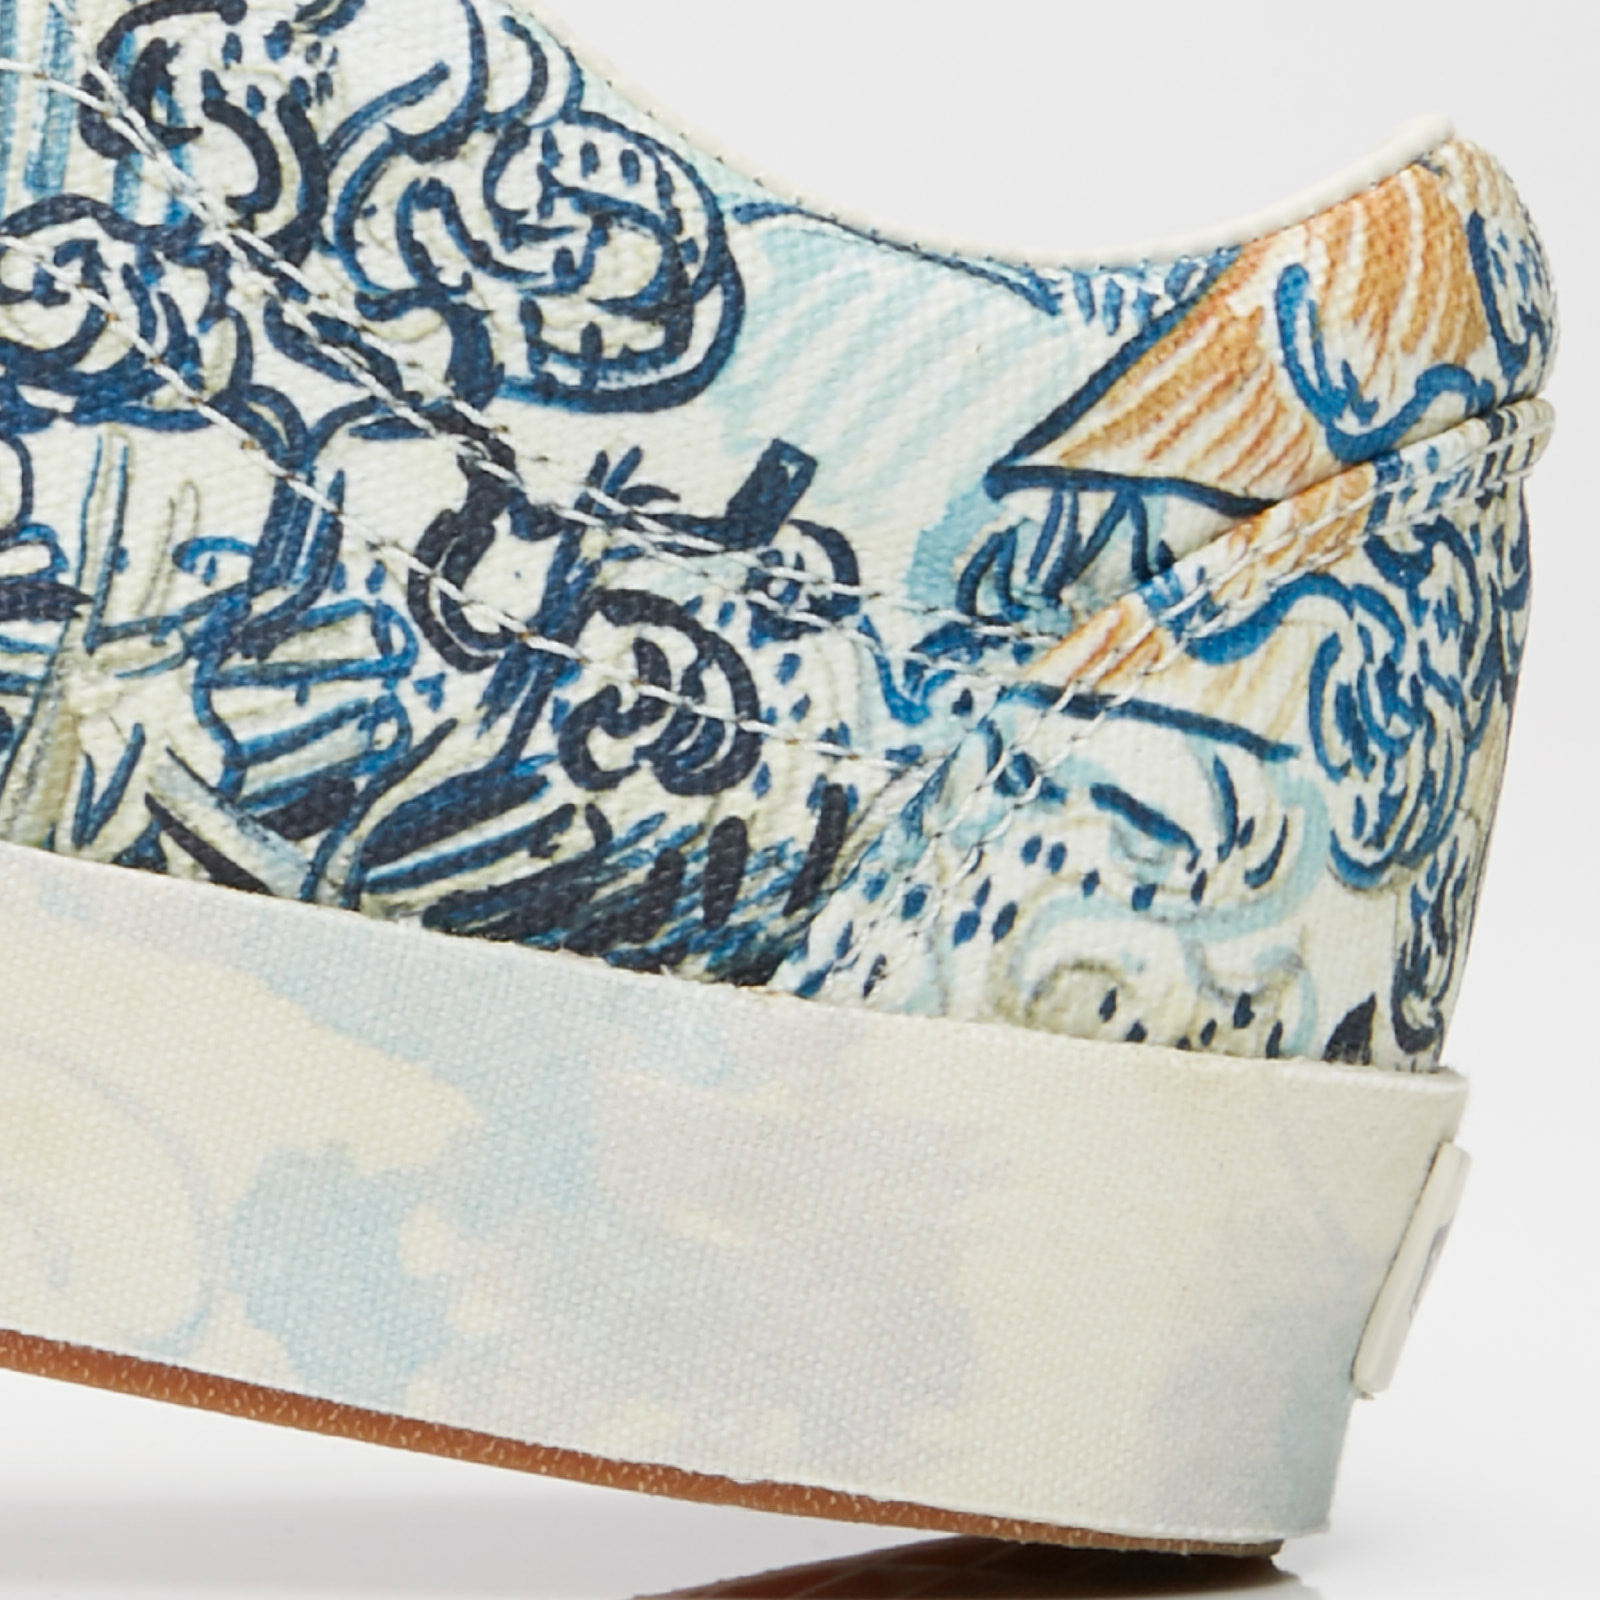 80f3249fbb6 Vans Vincent Van Gogh Old Skool - Va38g1uax - Sneakersnstuff ...